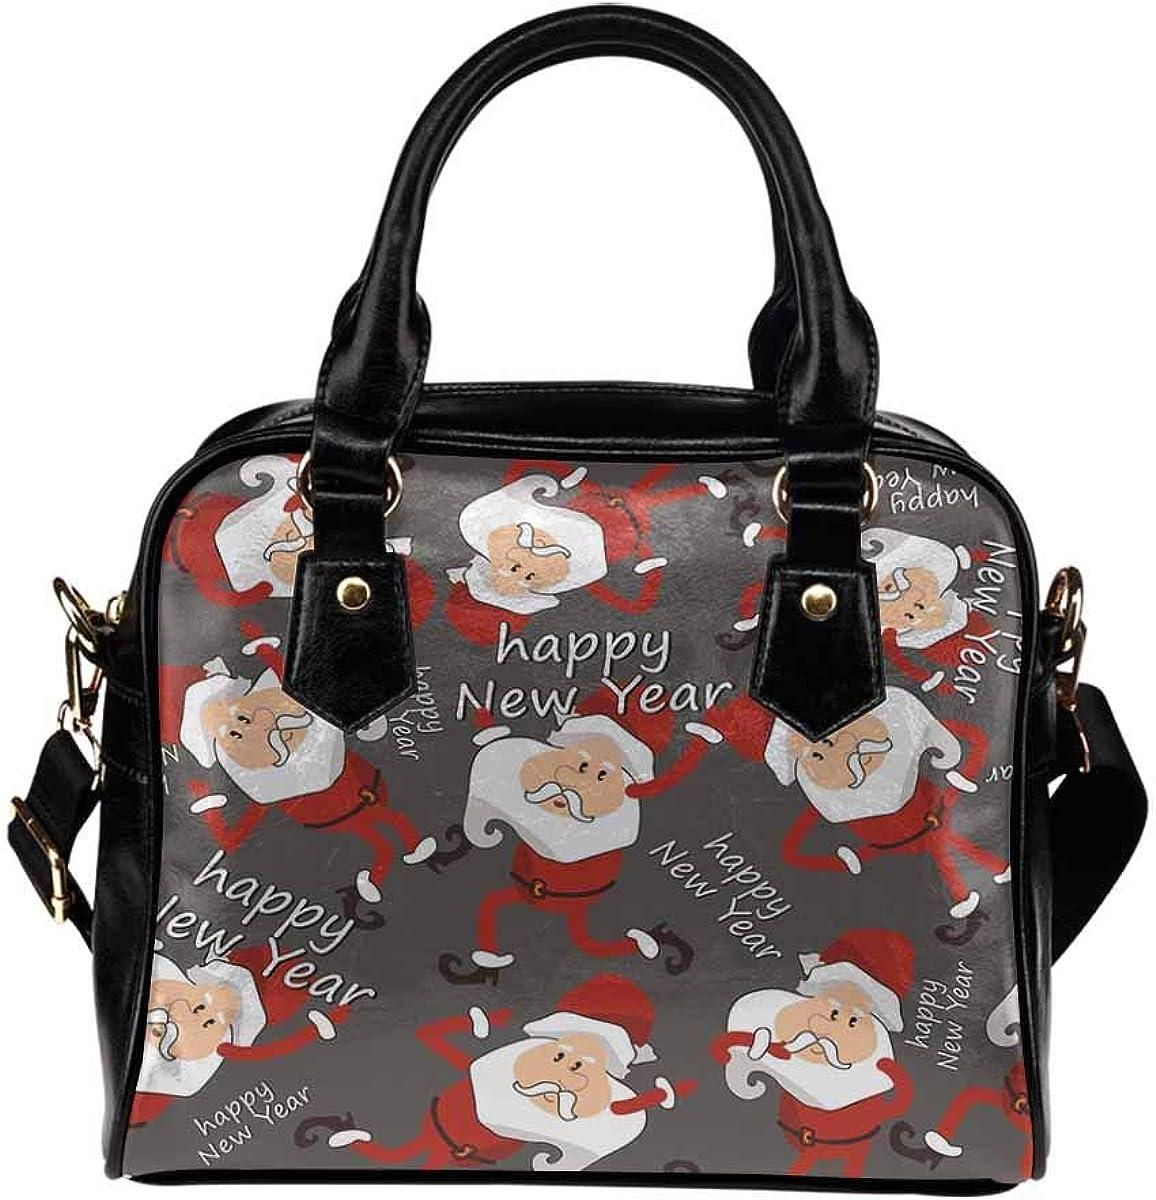 Christmas Knit Hats For Women Womens Classy Satchel Handbag Handbag With shoulder Strap Crossbody Bag